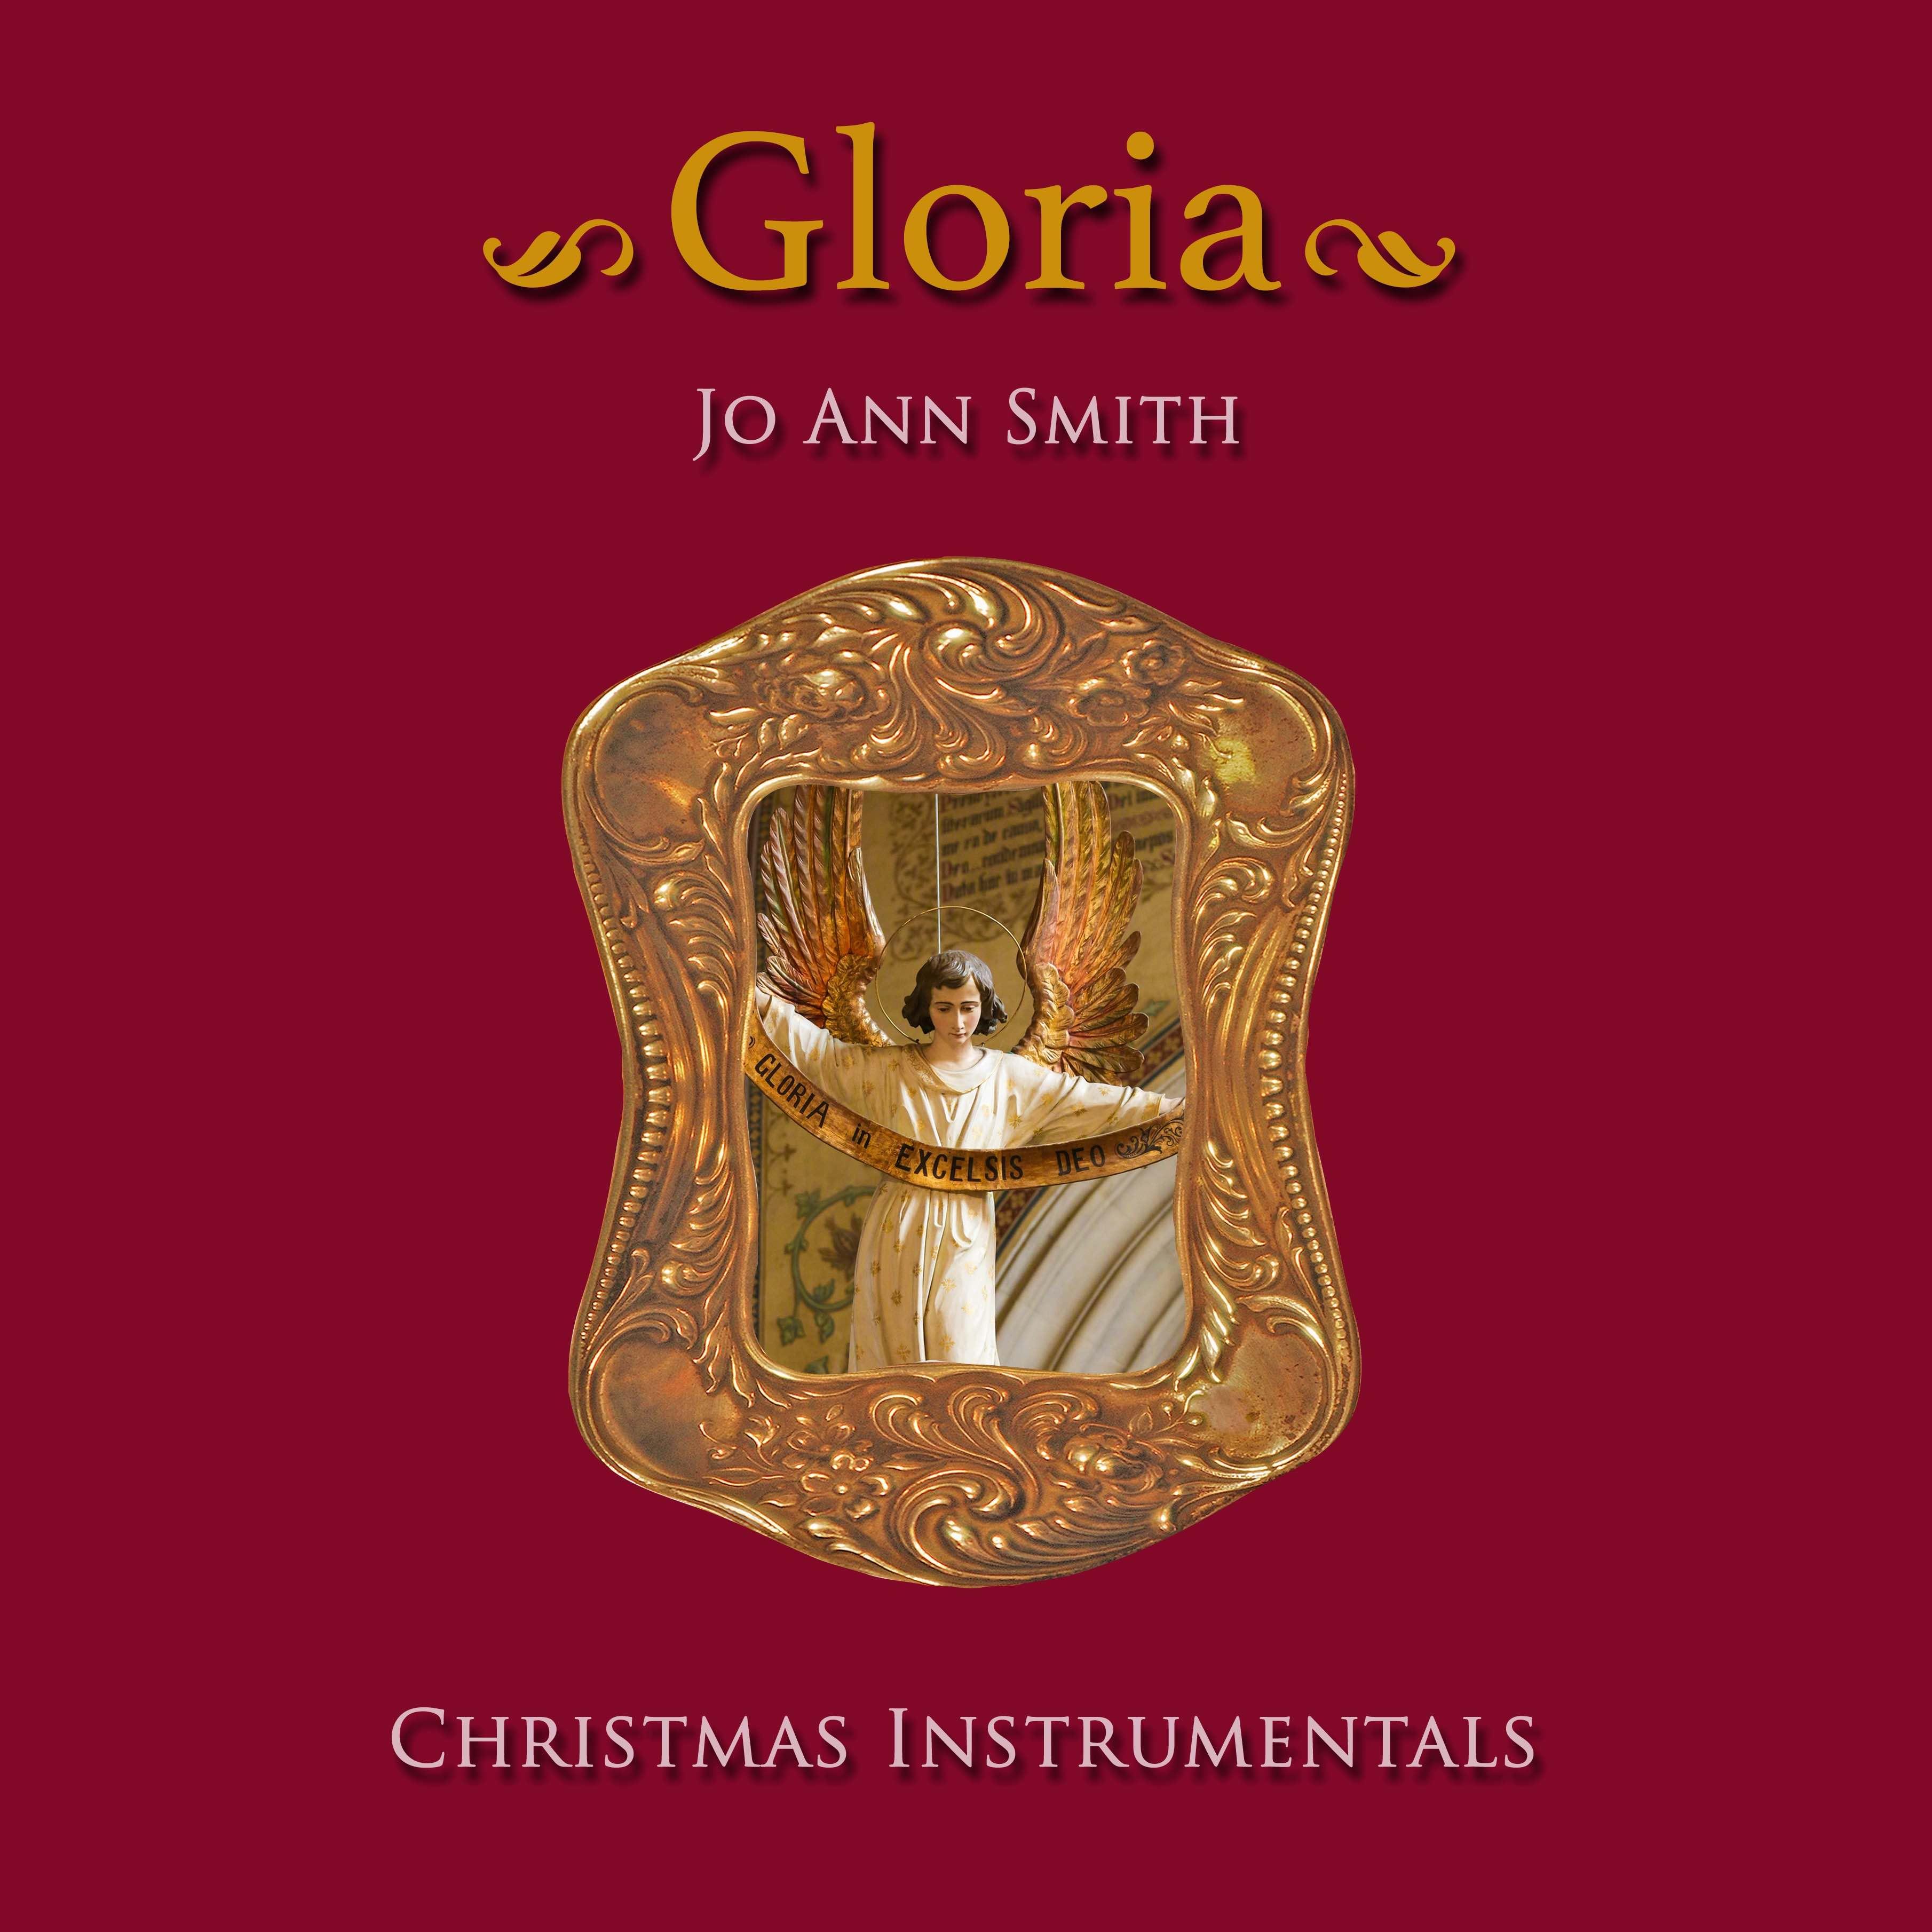 Get Holiday Ready With Jo Ann Smith's 'Gloria'